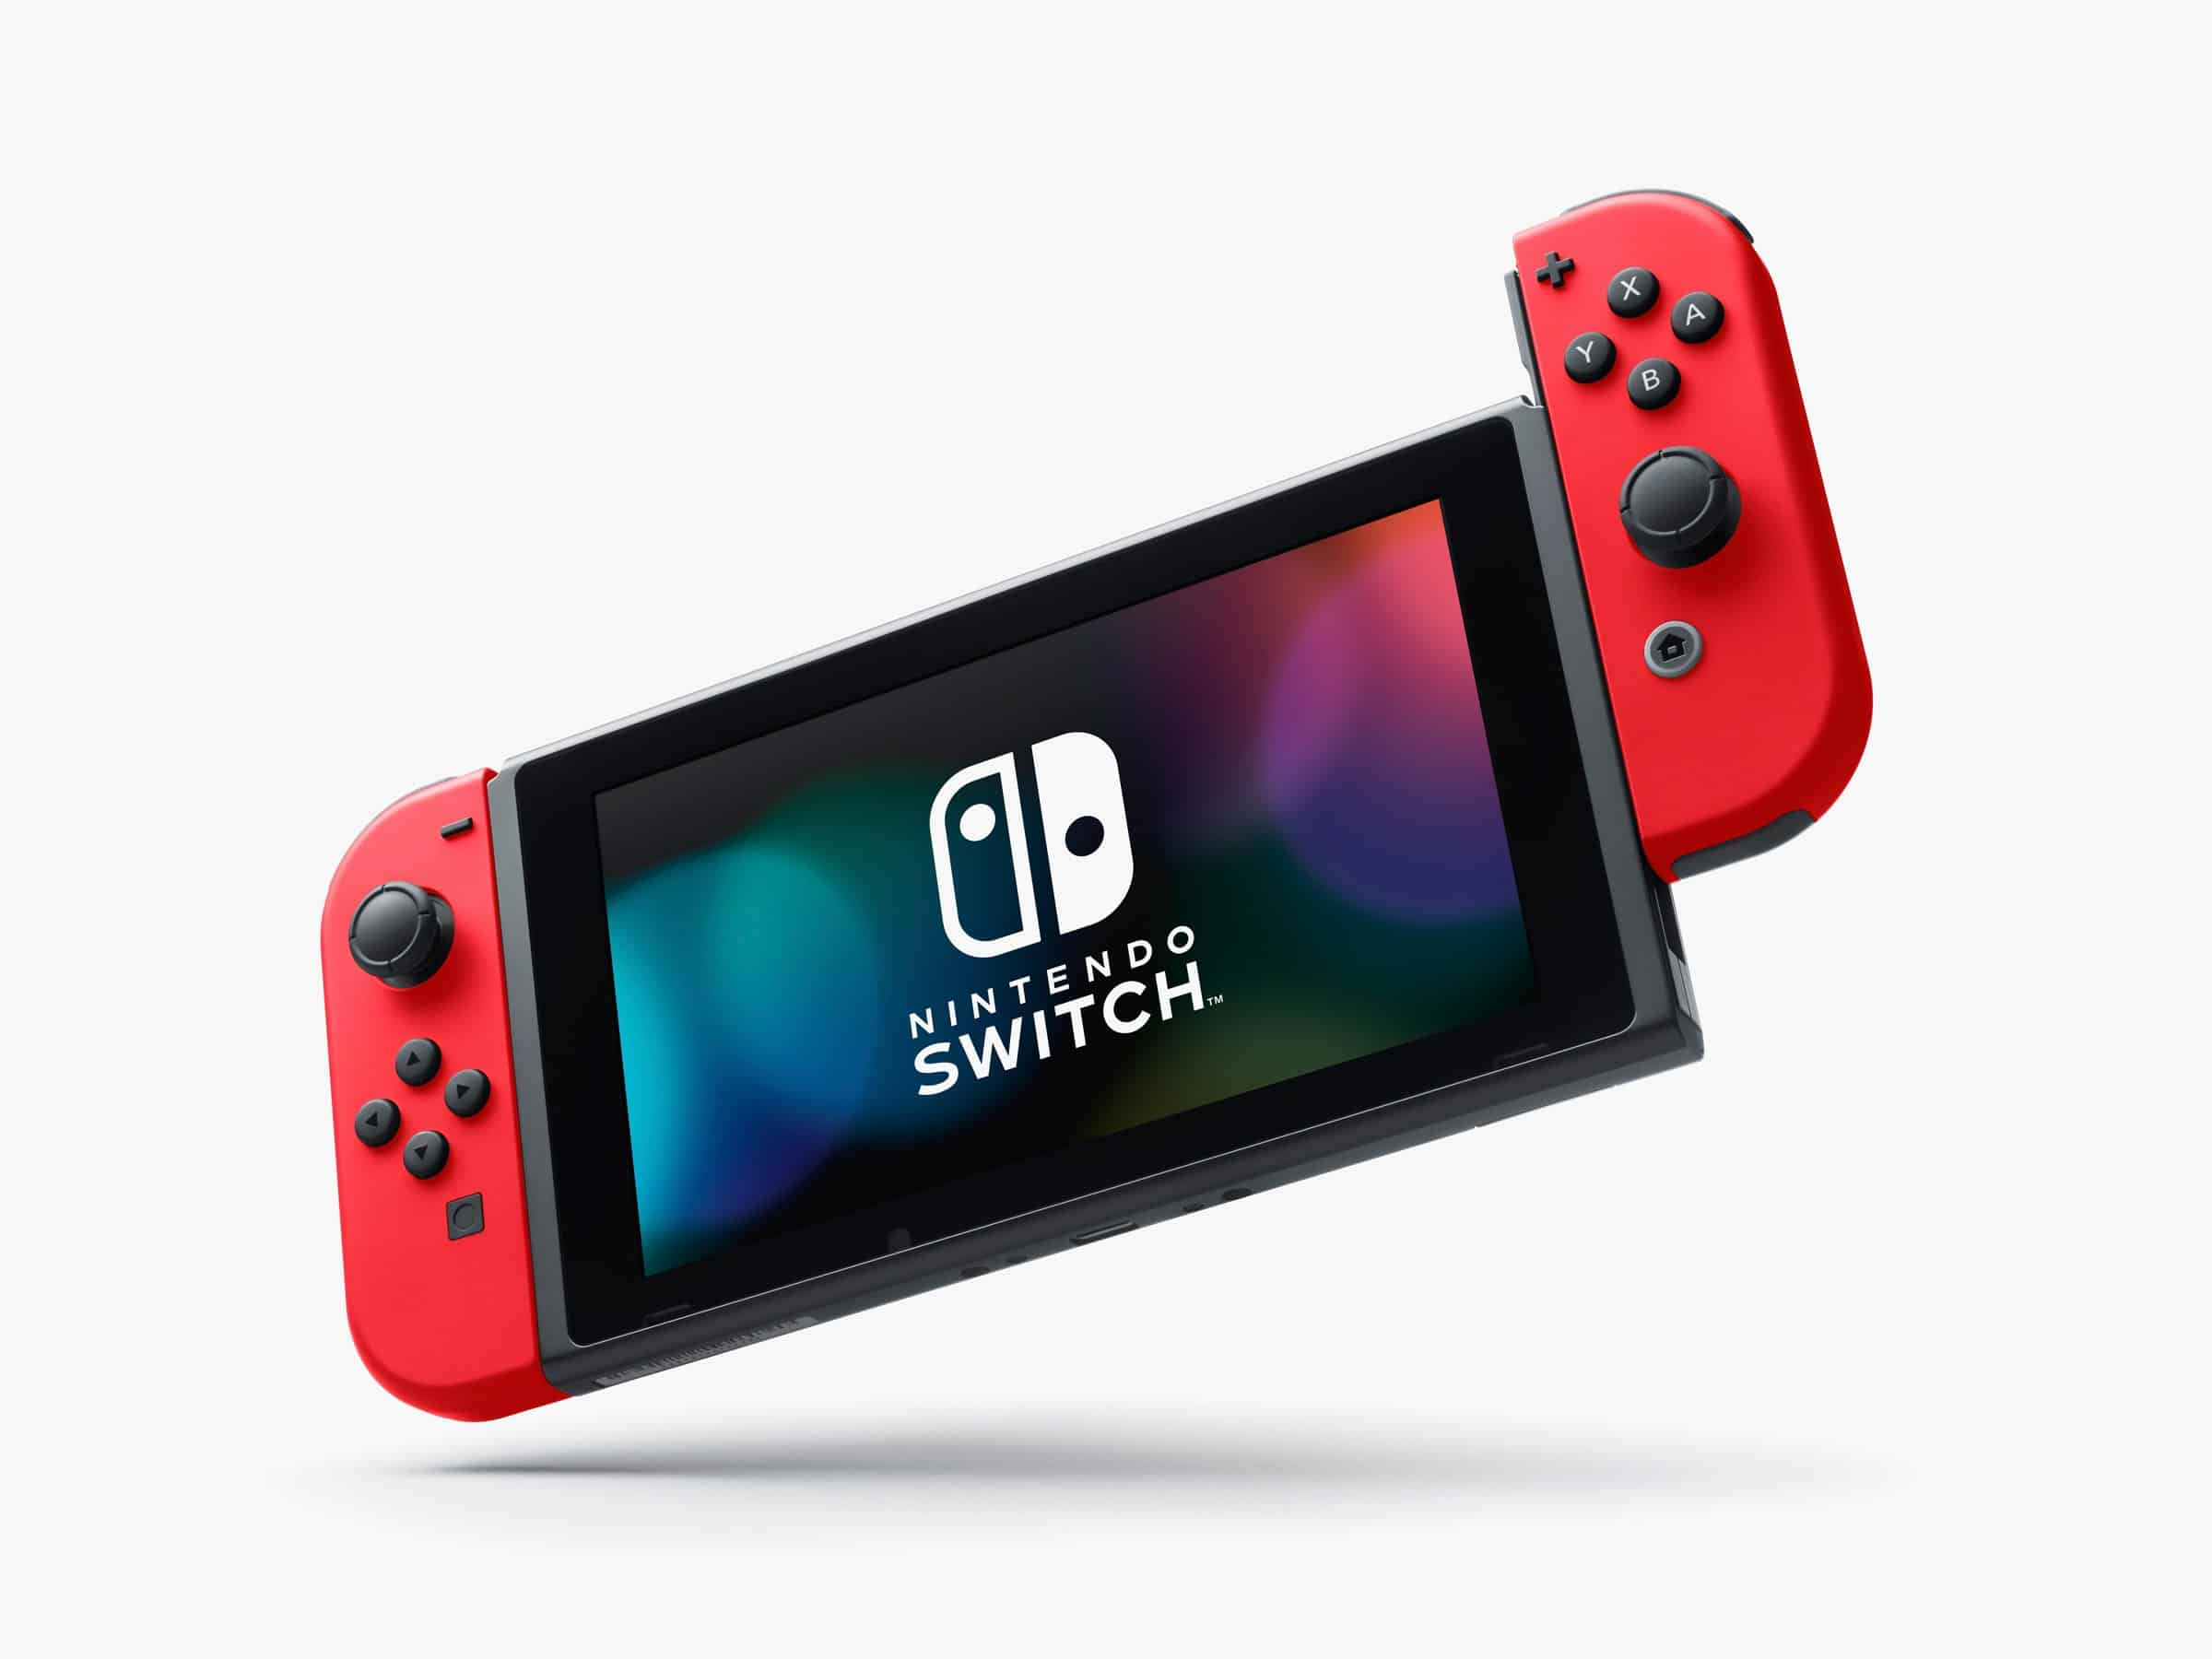 Nintendo Switch Mini Direct New Games